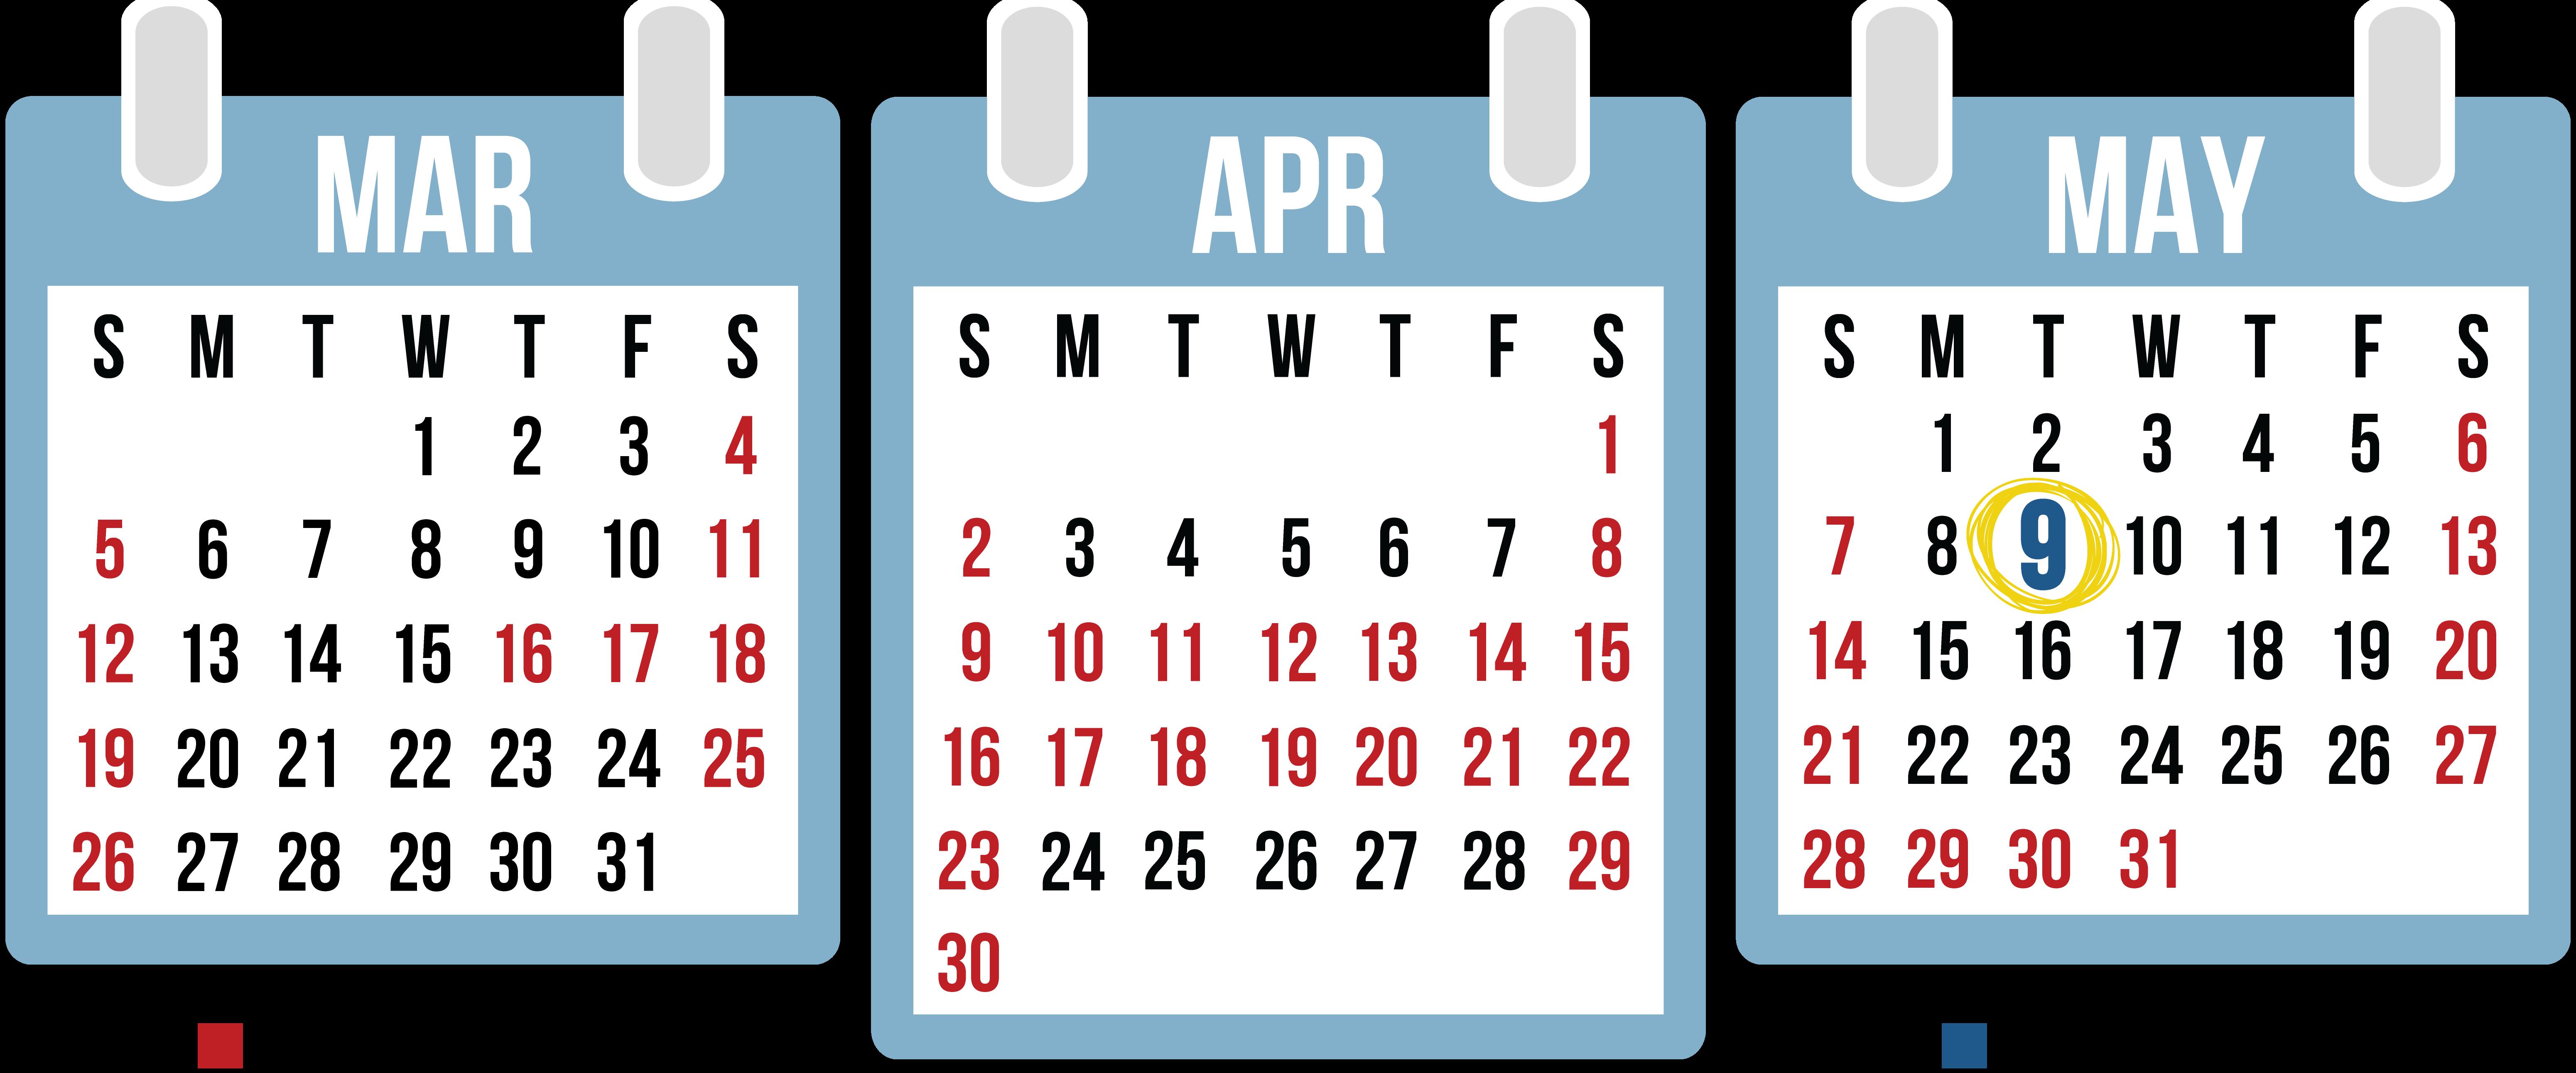 CRA Calendar Last Days